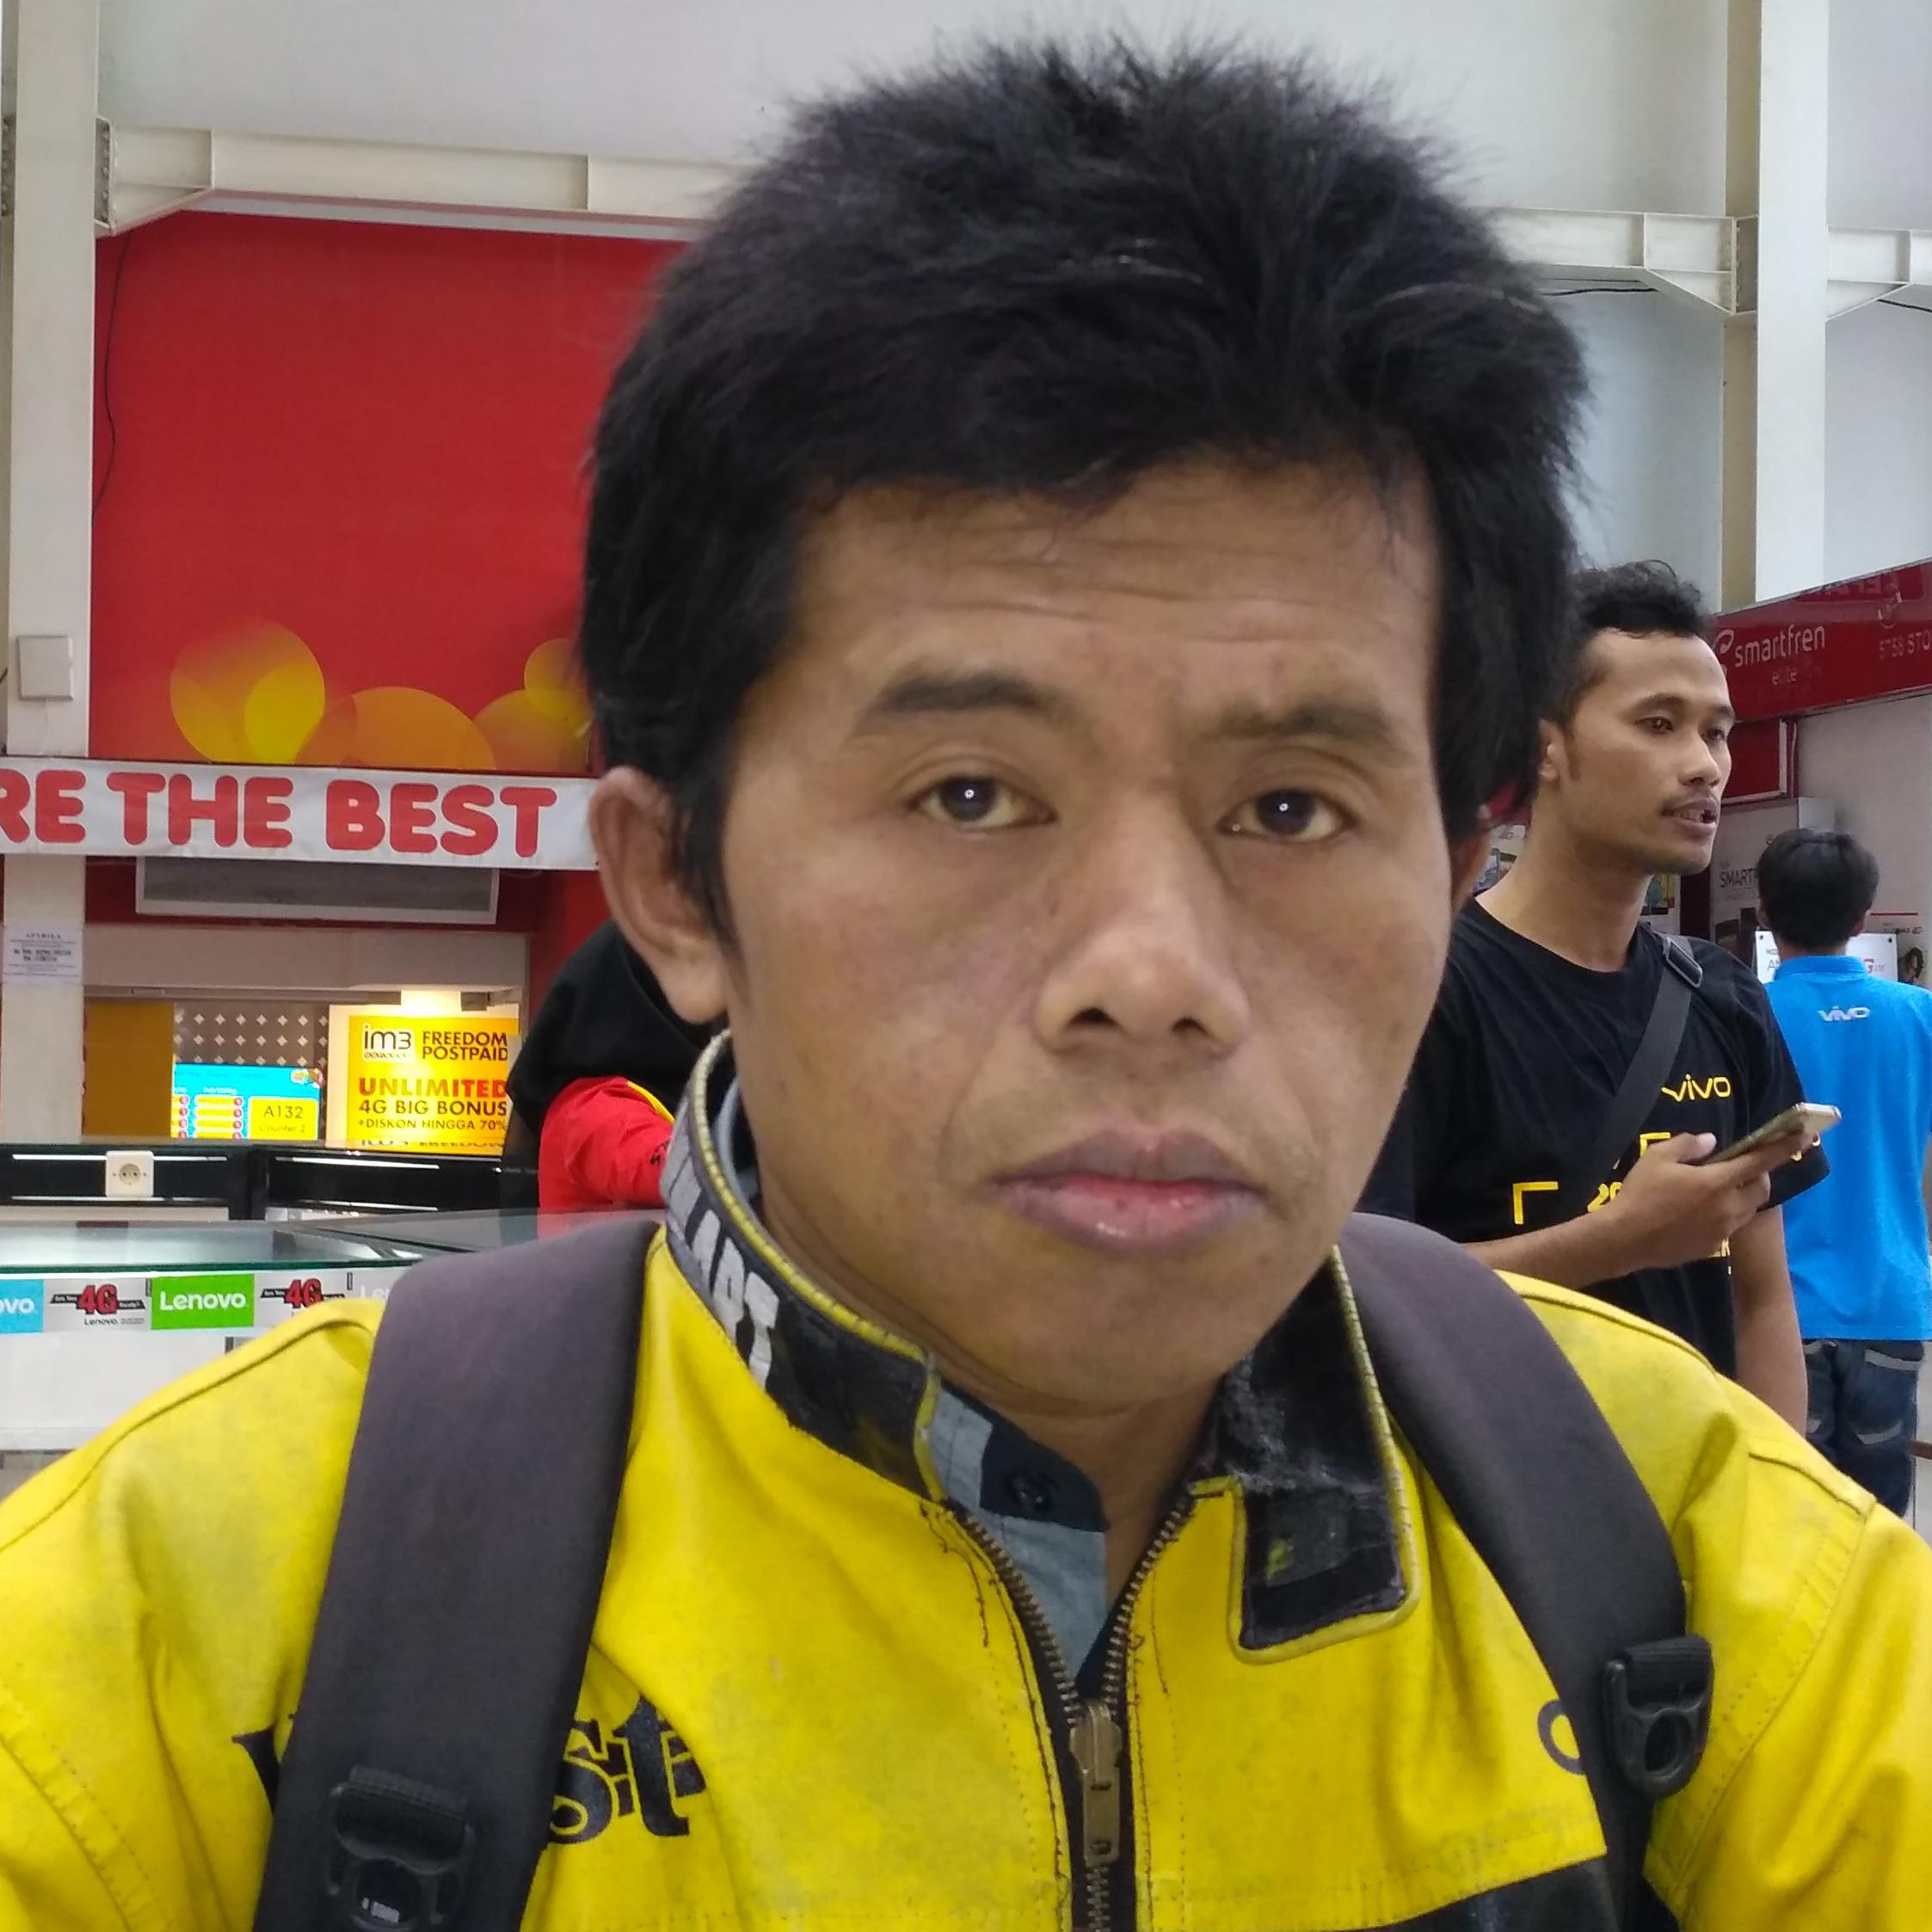 Syahir Achmadi